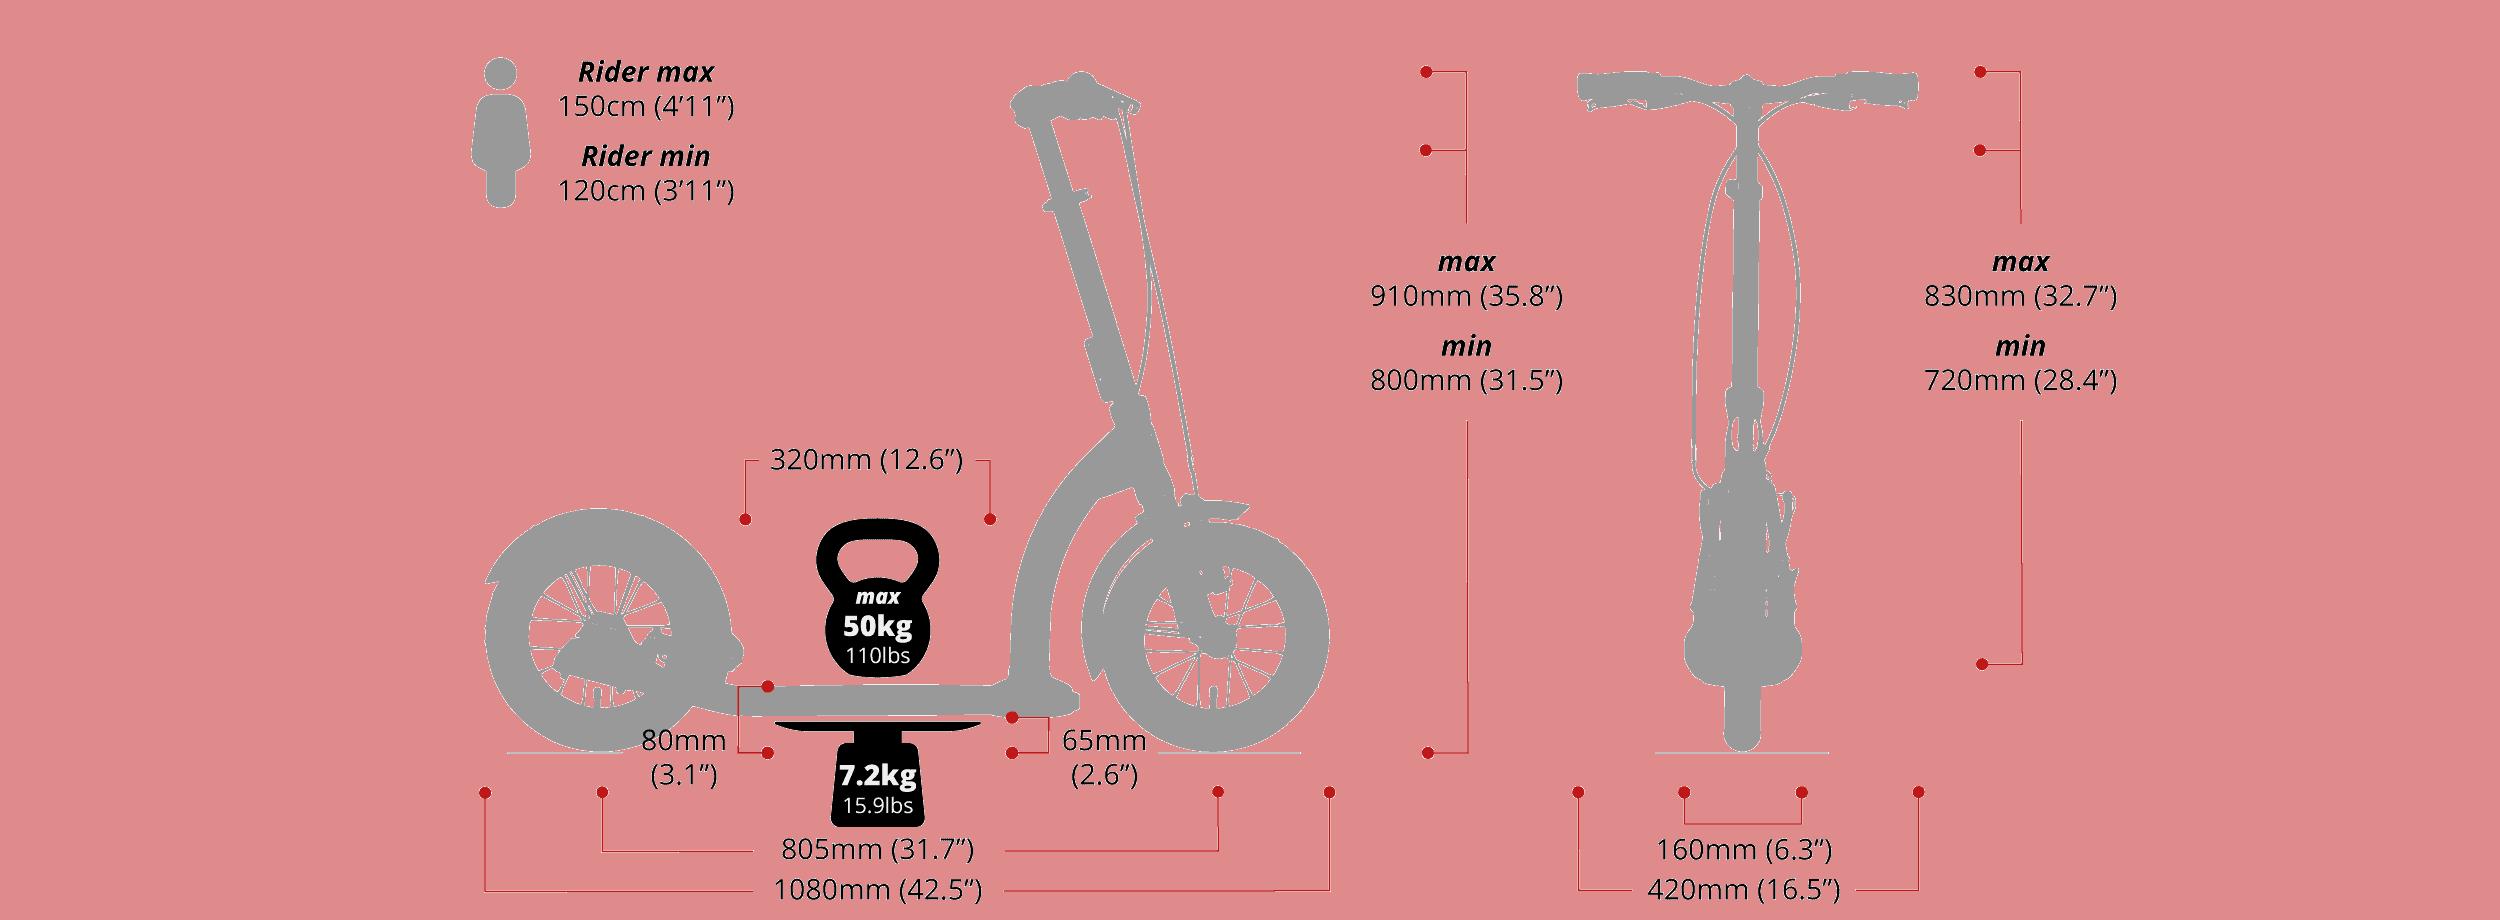 Swifty-IXI-Kinderroller-Maße-Größe-Länge